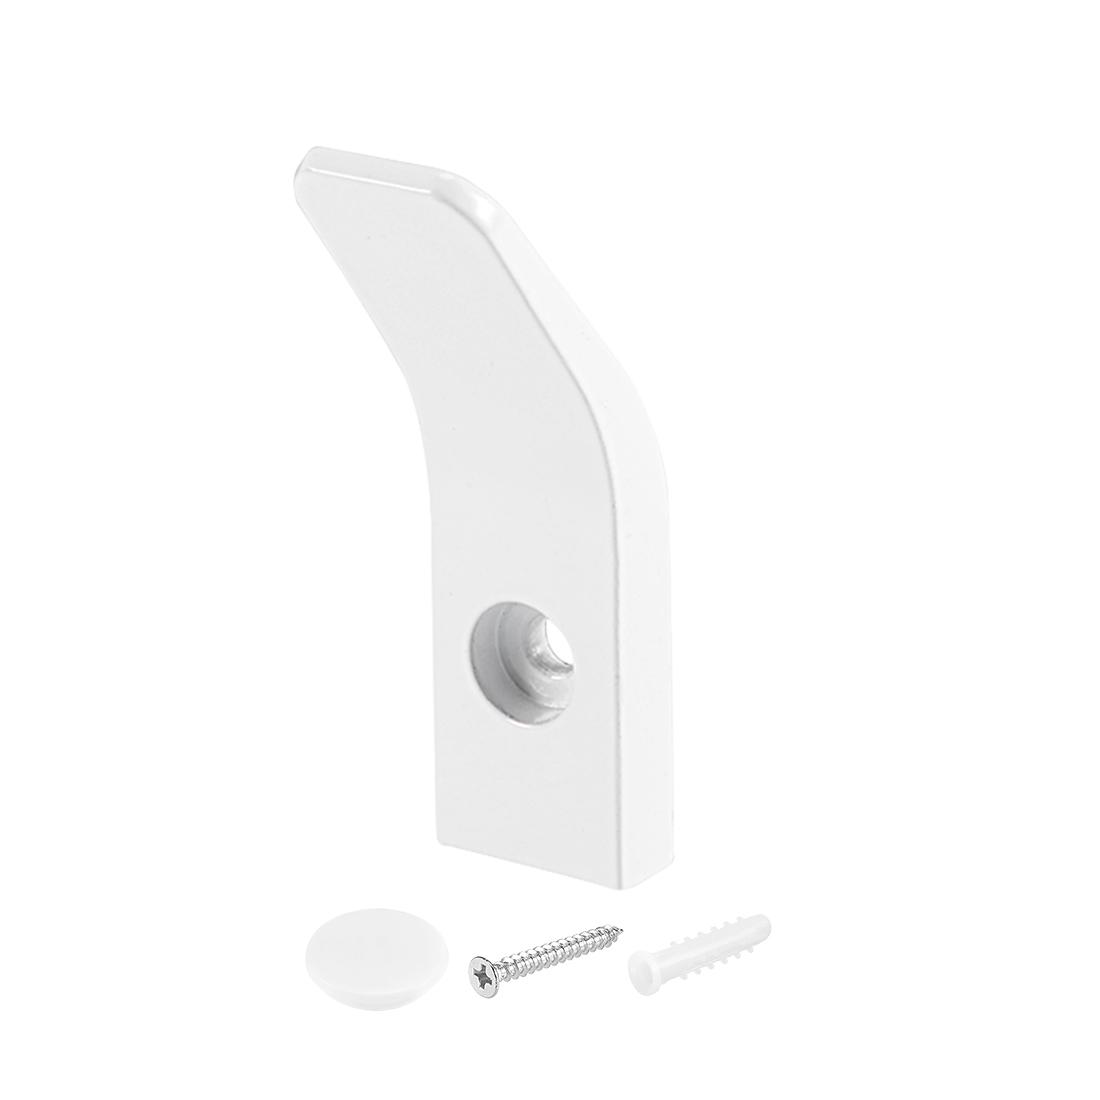 Single Hook Wall Mounted Coat Towel Hanger Aluminum Hooks 70x20mm White 4Pcs